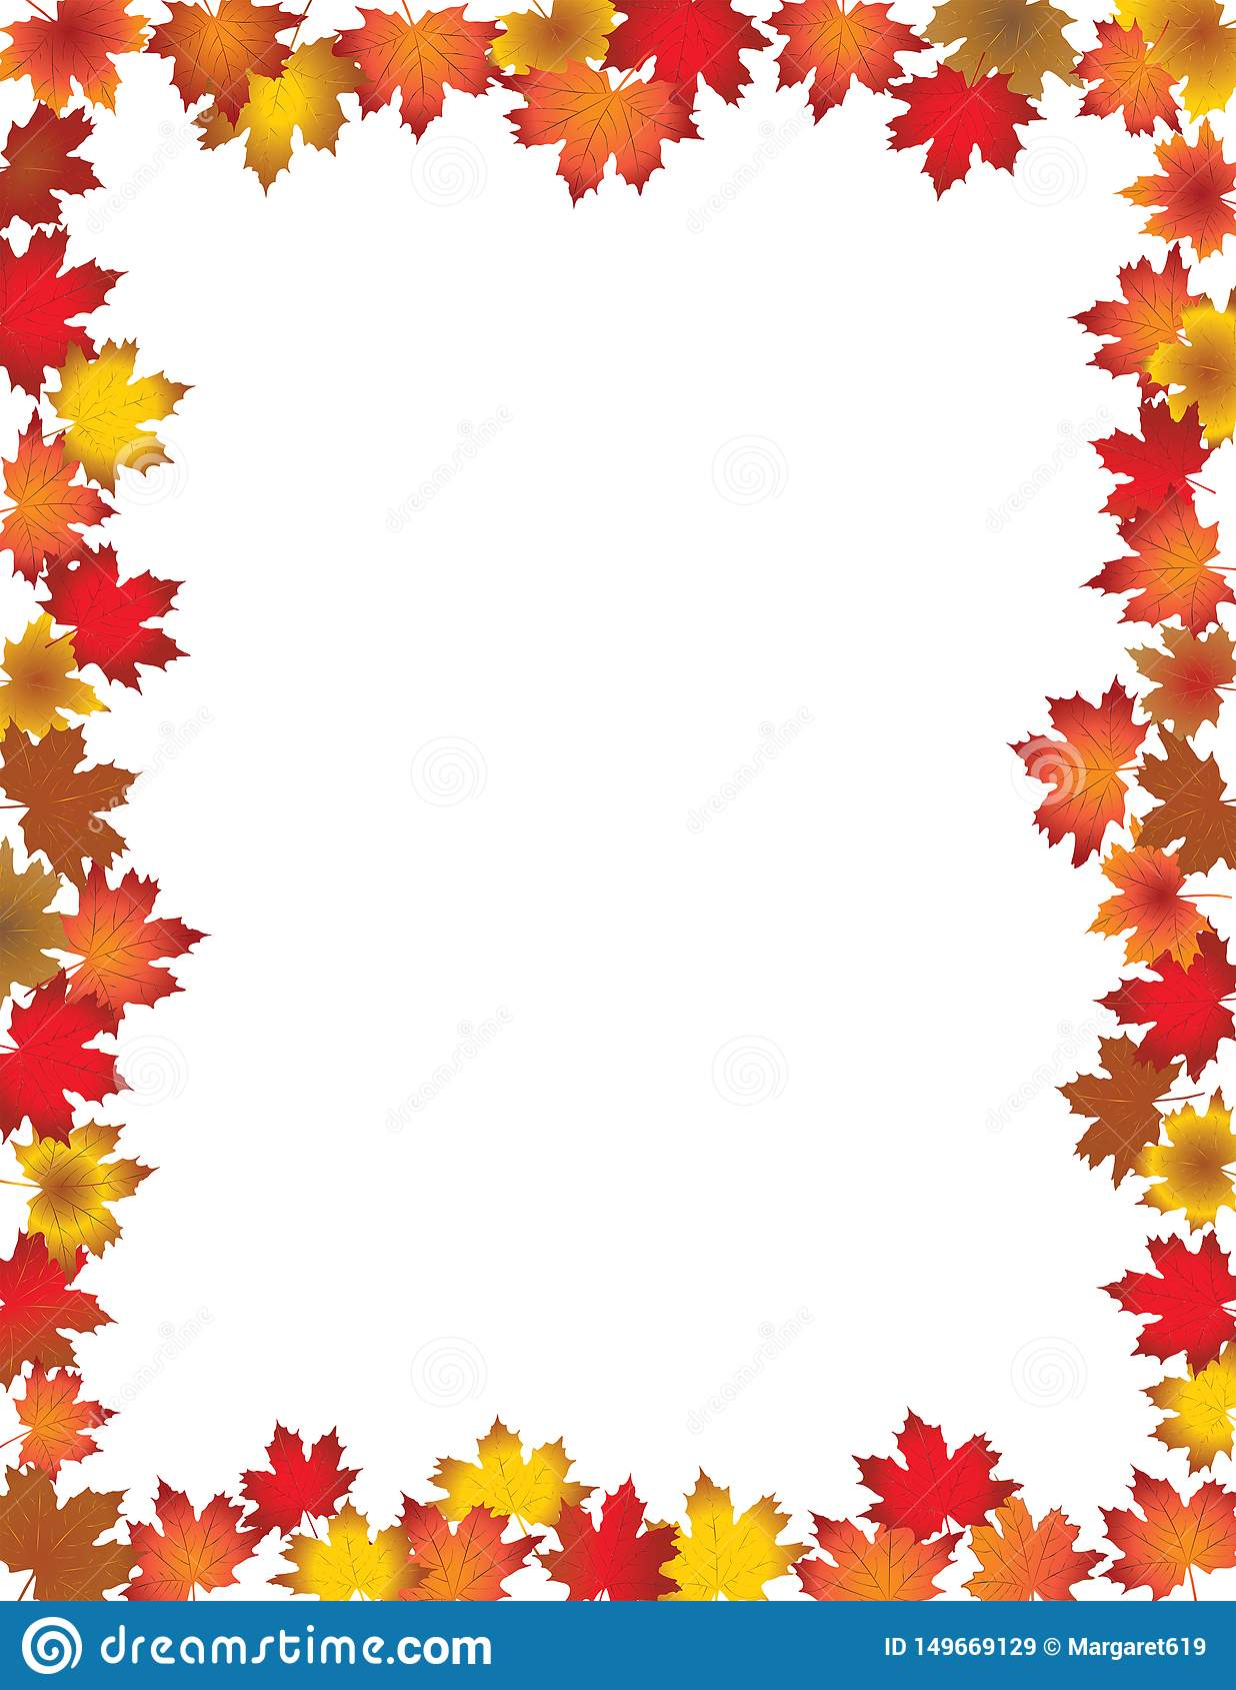 Fall Leaves Border on White Background.